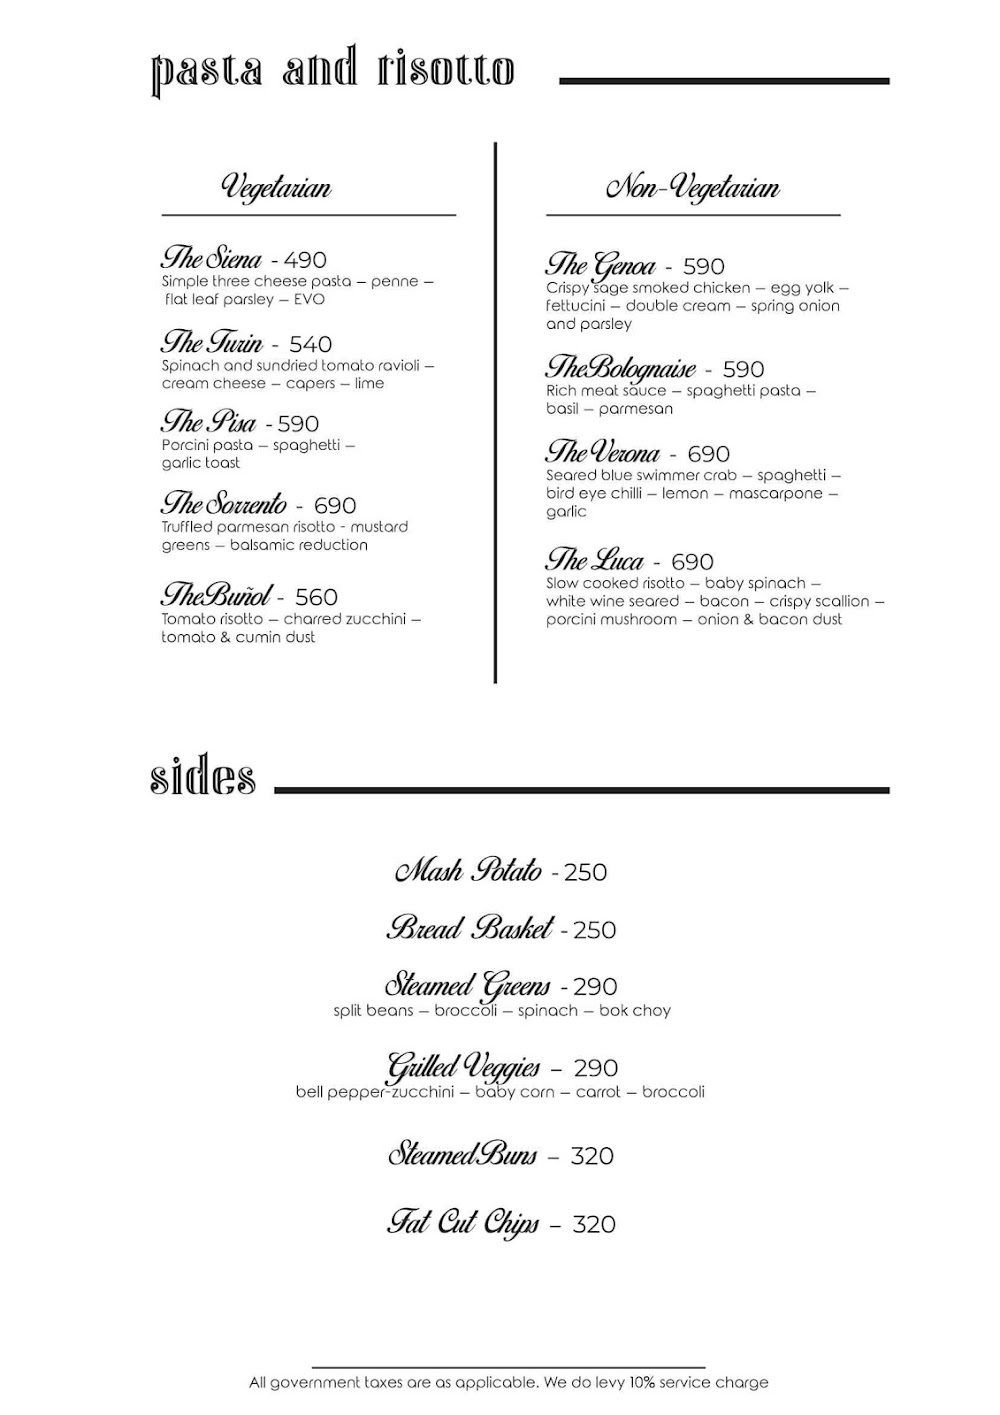 Rocky Star Cafe & Bar menu 1